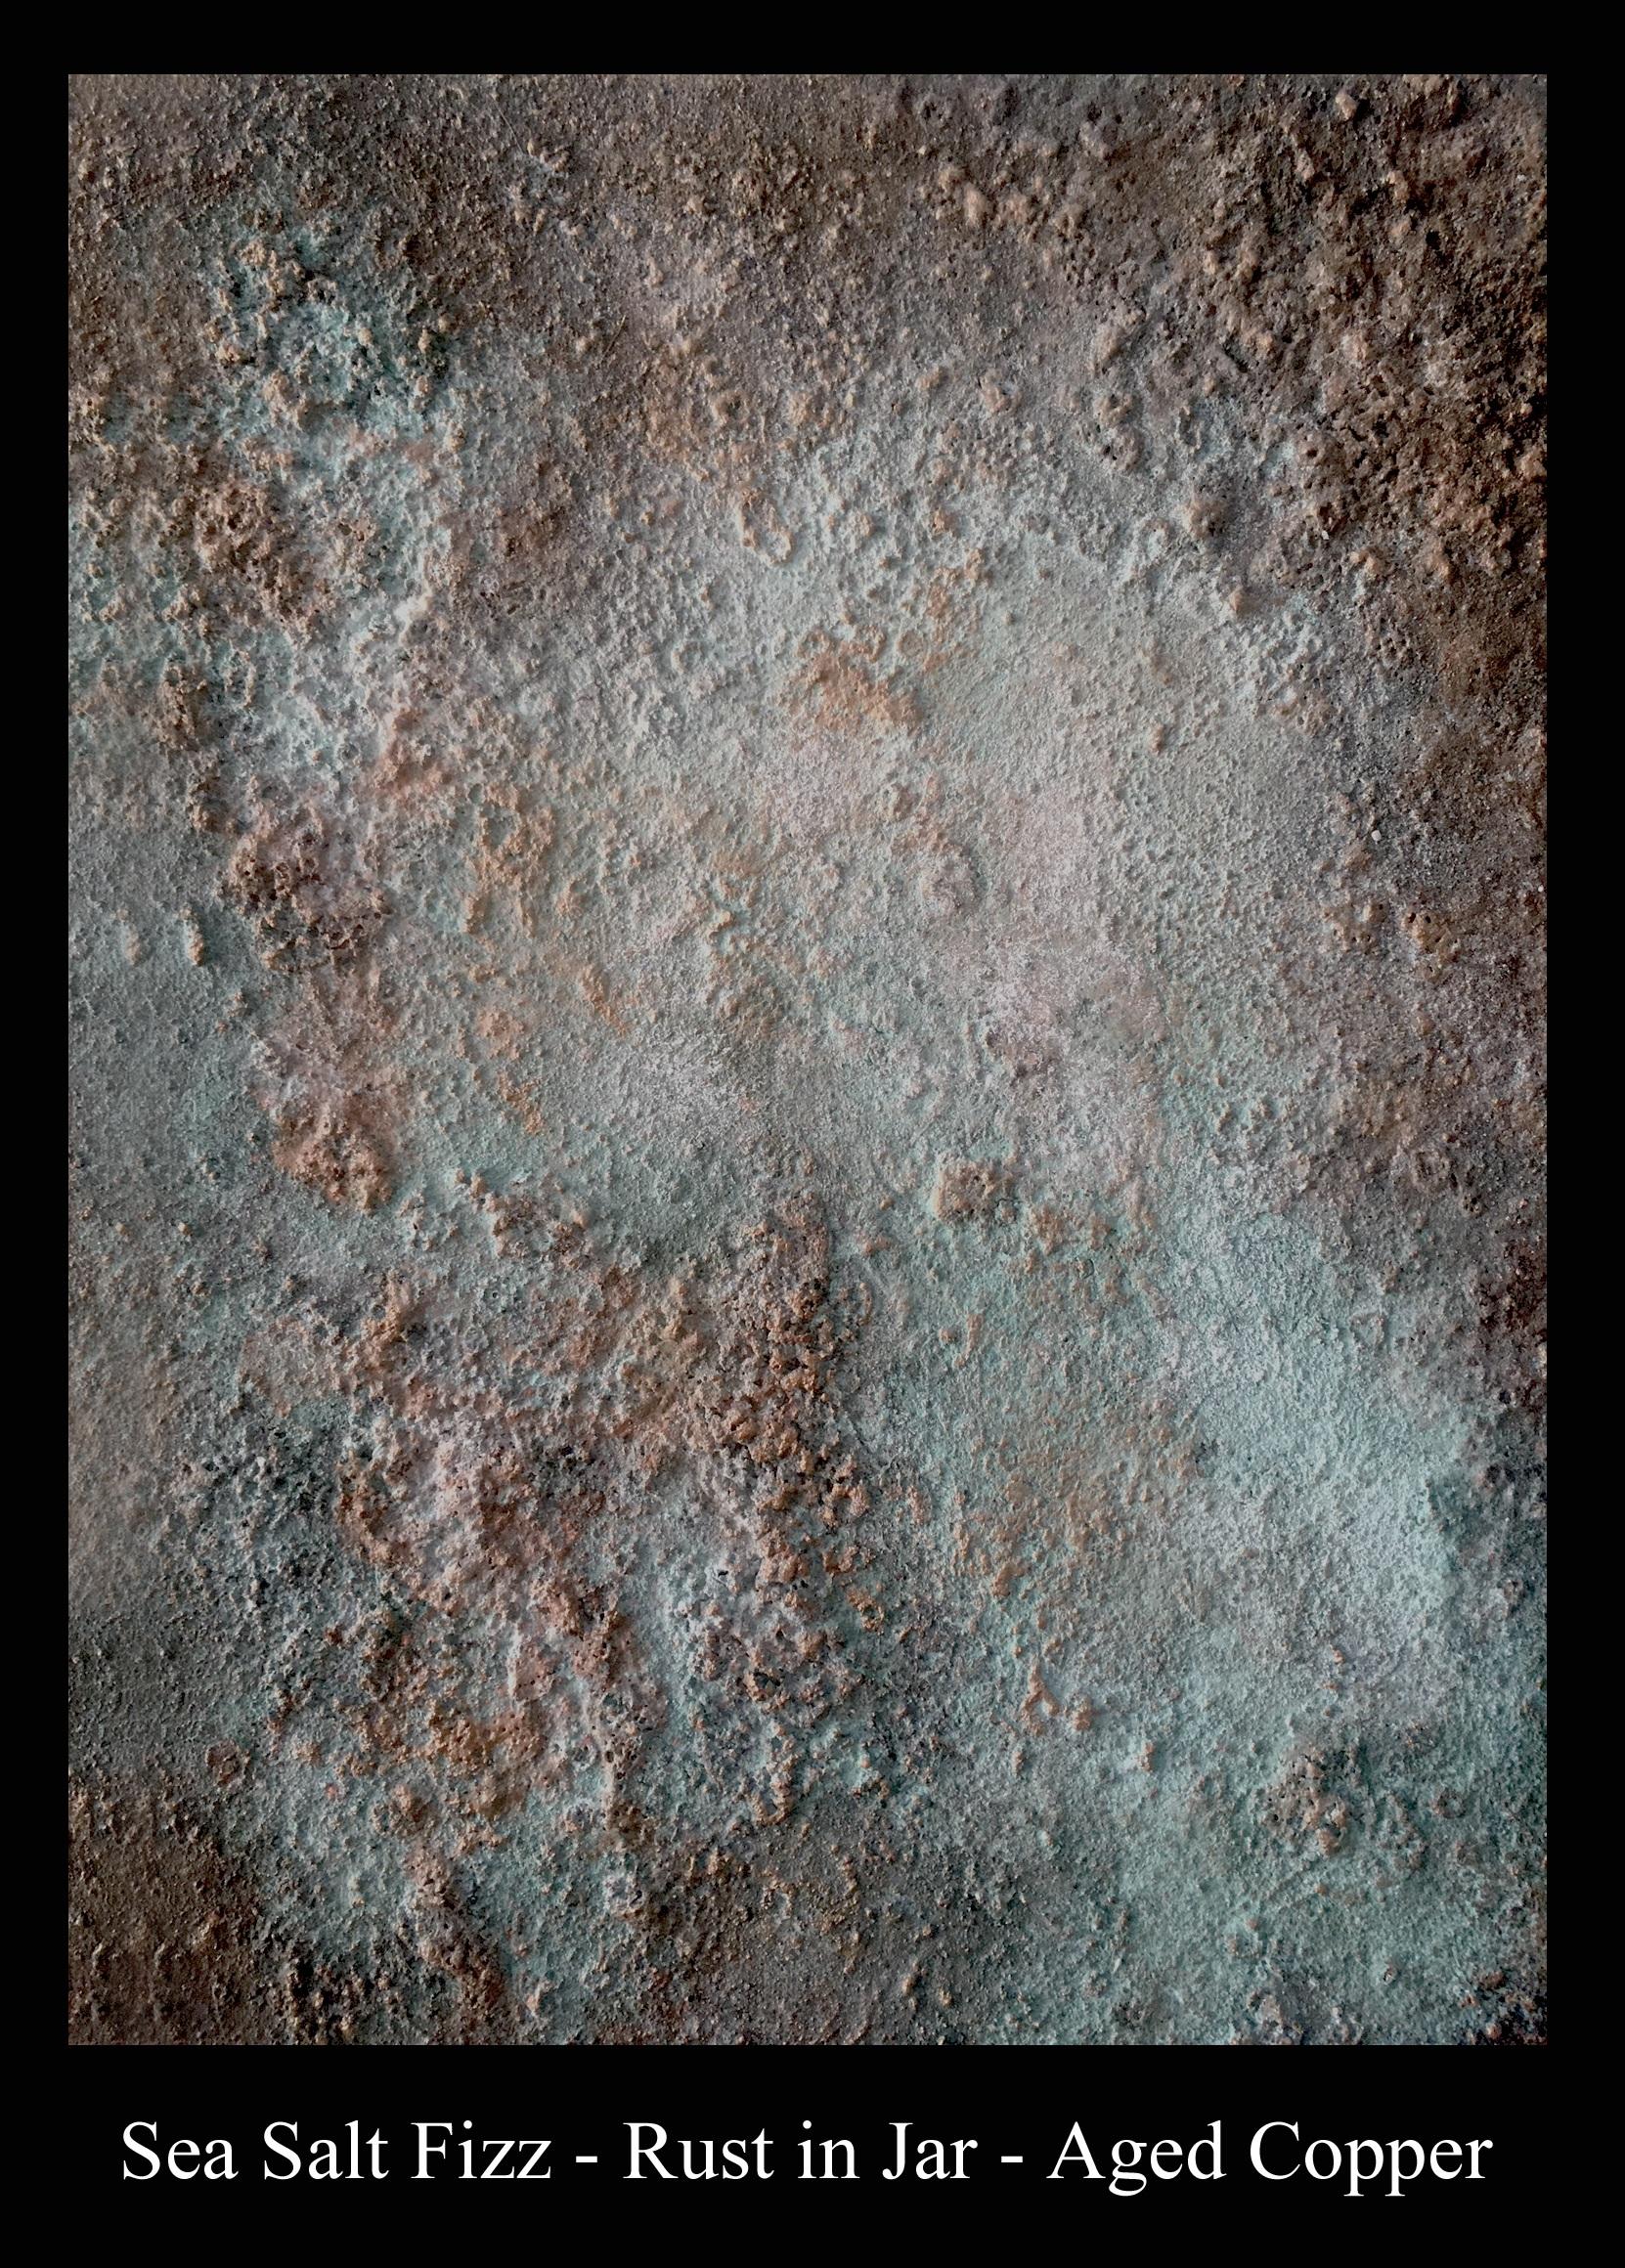 Aged Copper  & Sea Salt Fizz